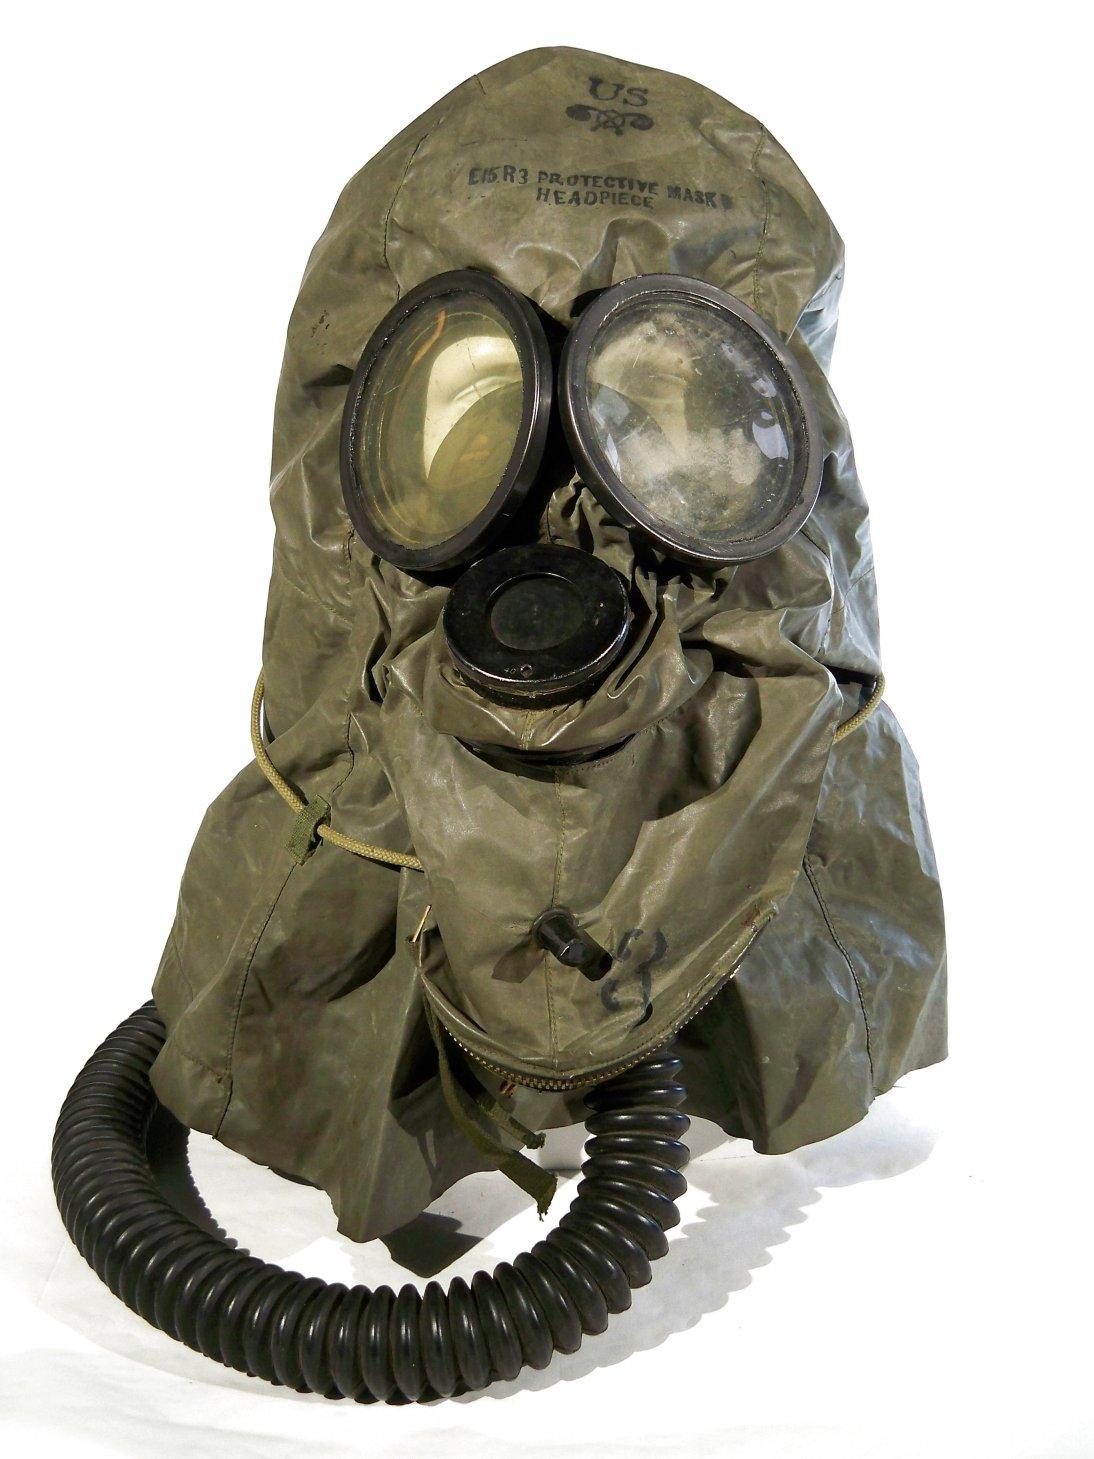 E15R3 Protective Mask Headpiece